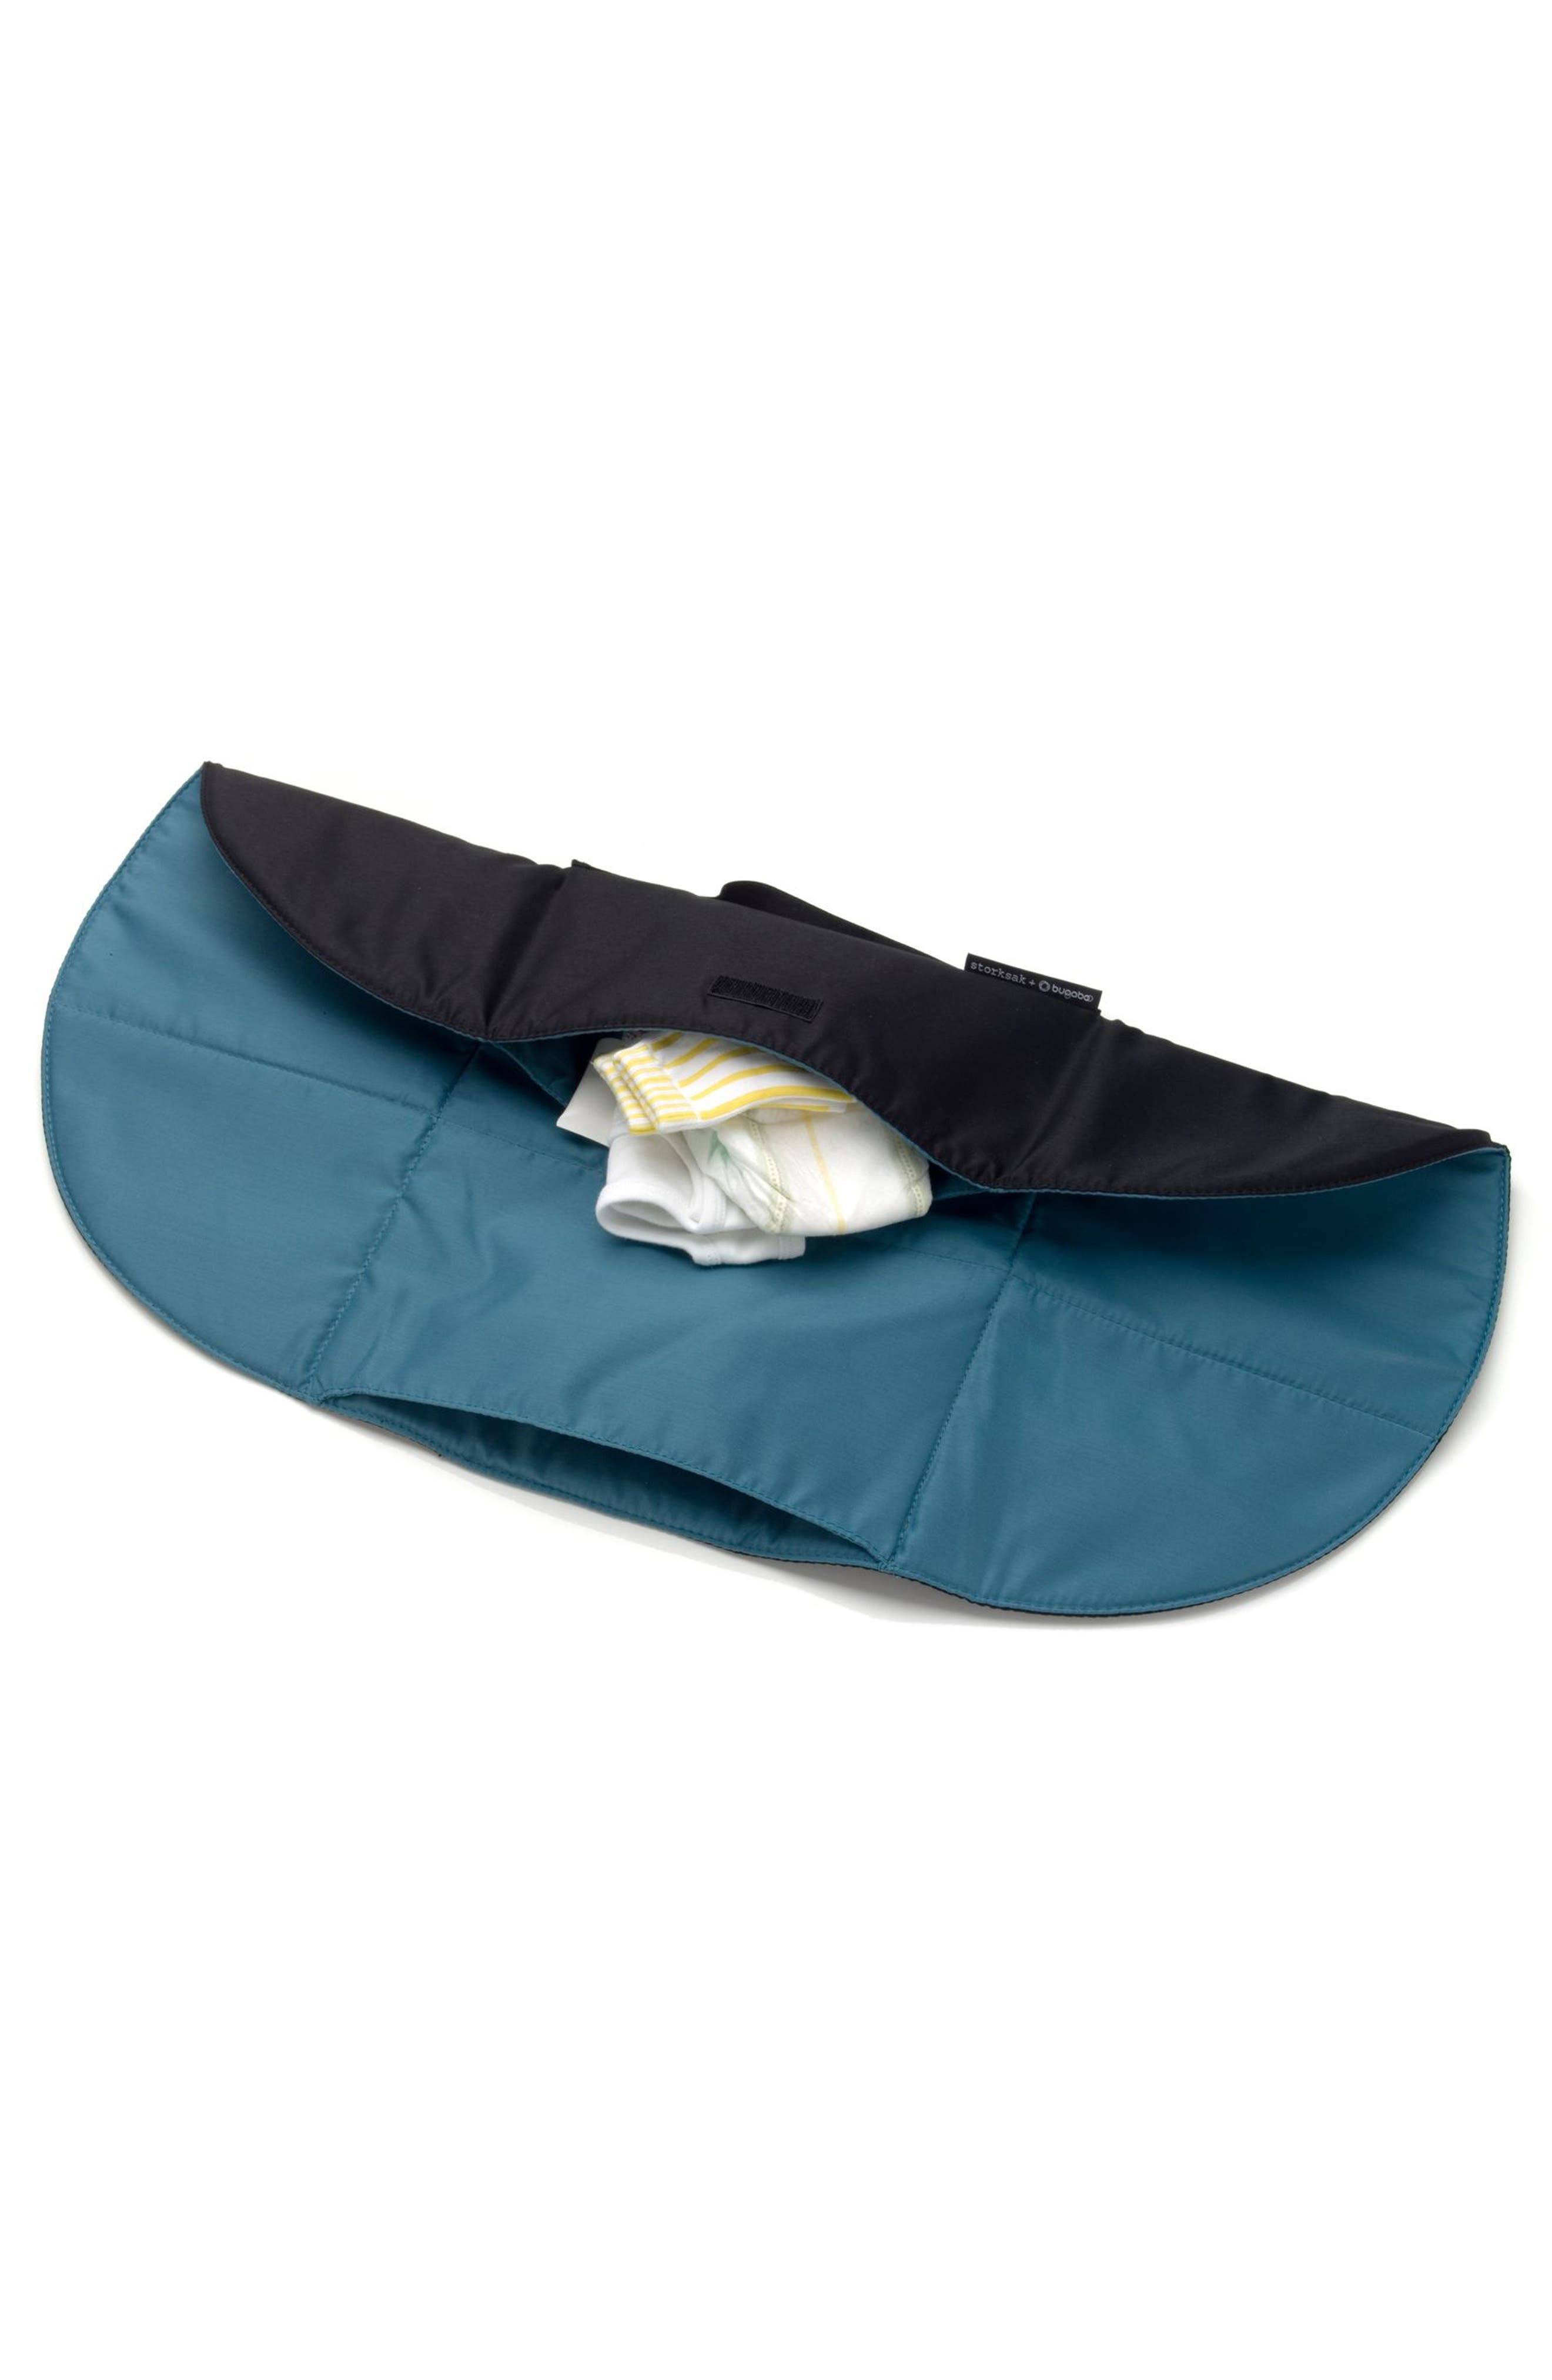 x Storksak Leather Diaper Tote Bag,                             Alternate thumbnail 2, color,                             Black